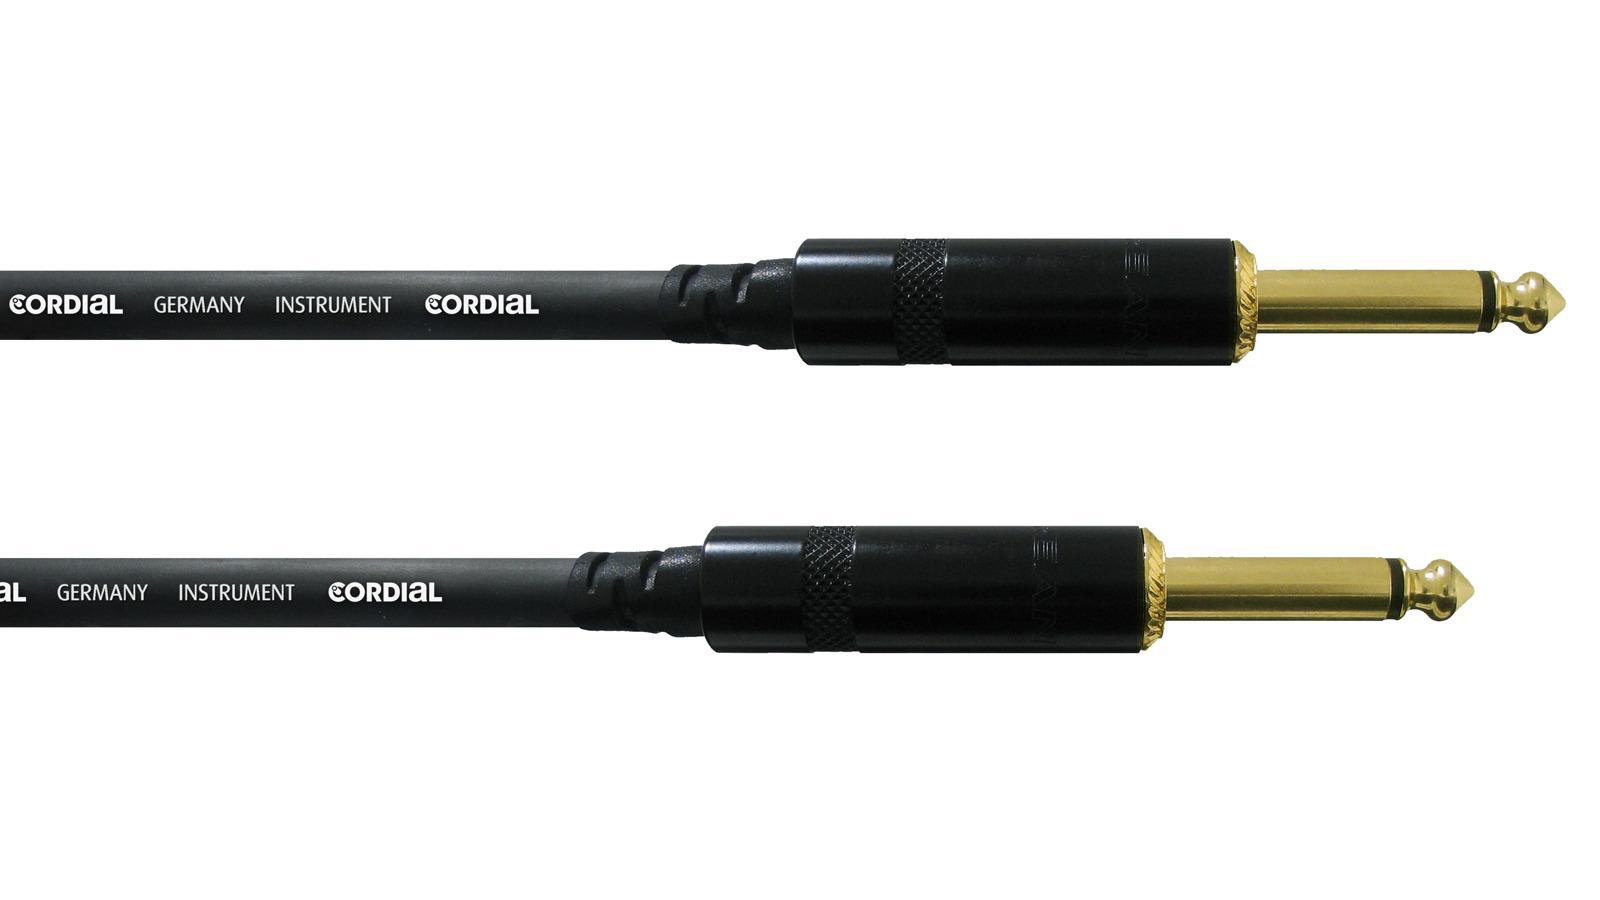 Cordial CCI 6 PP Instrumentenkabel 6 m